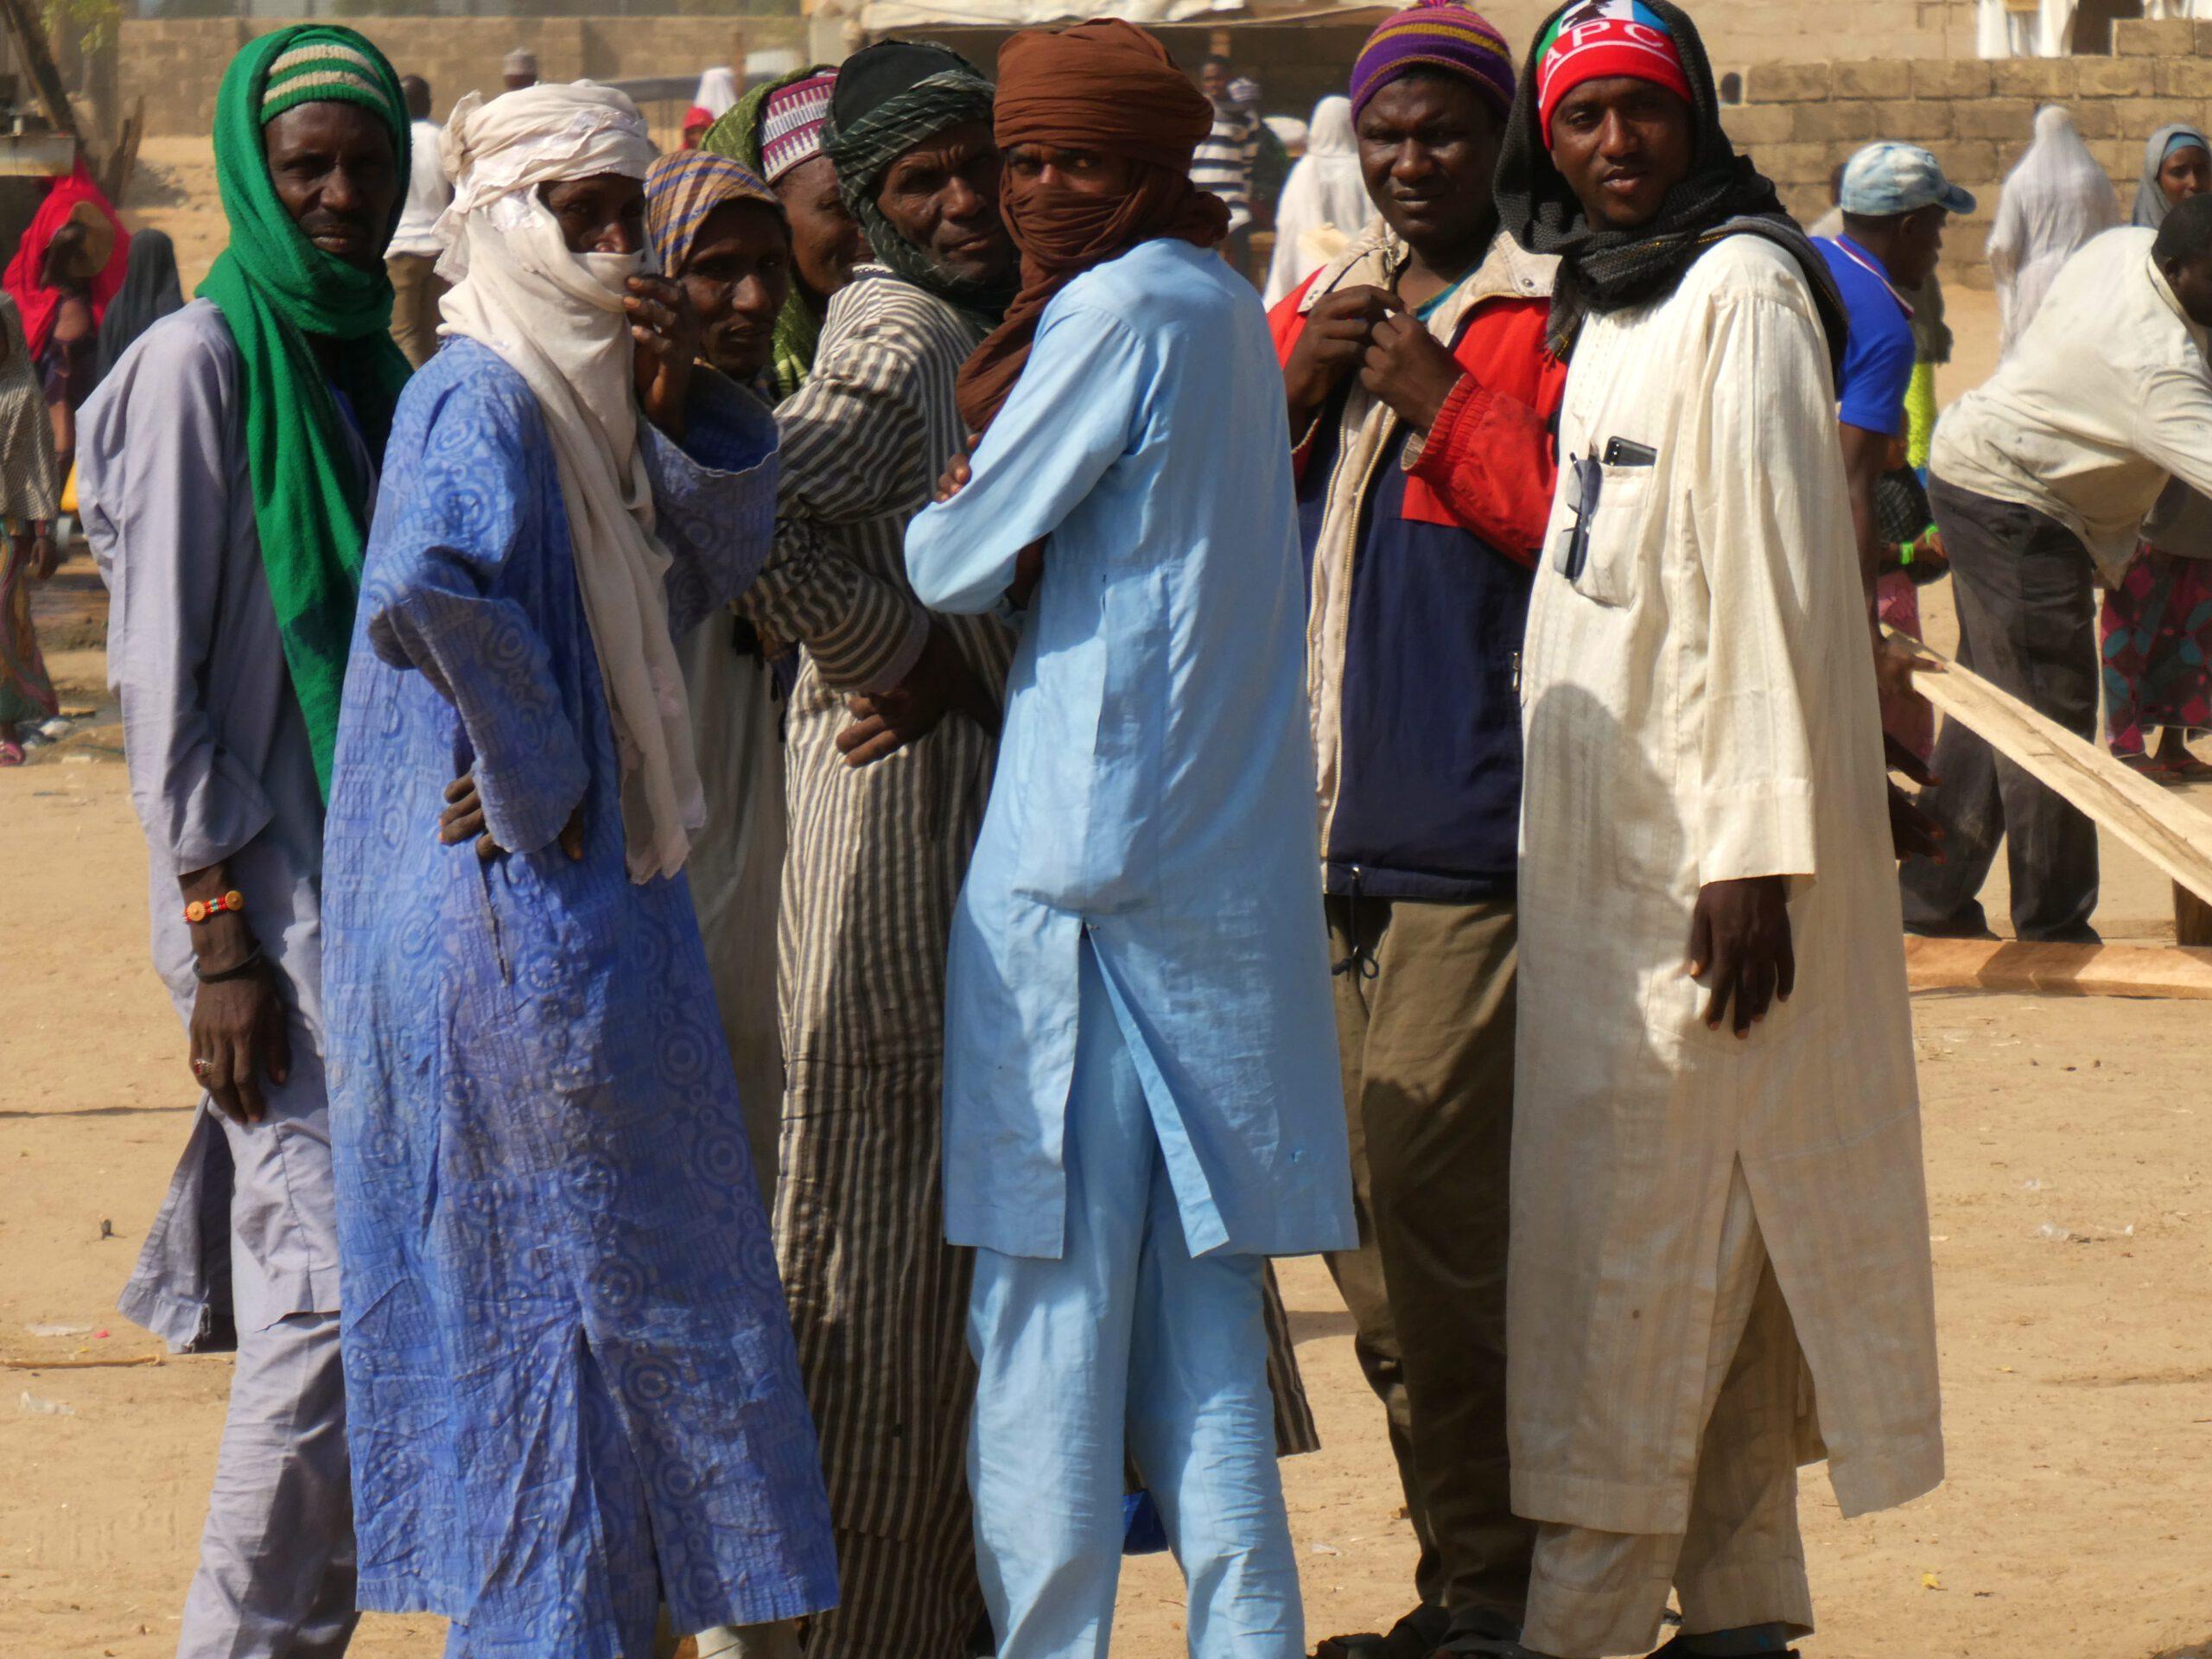 Unos hombres mirándome en Maiduguri